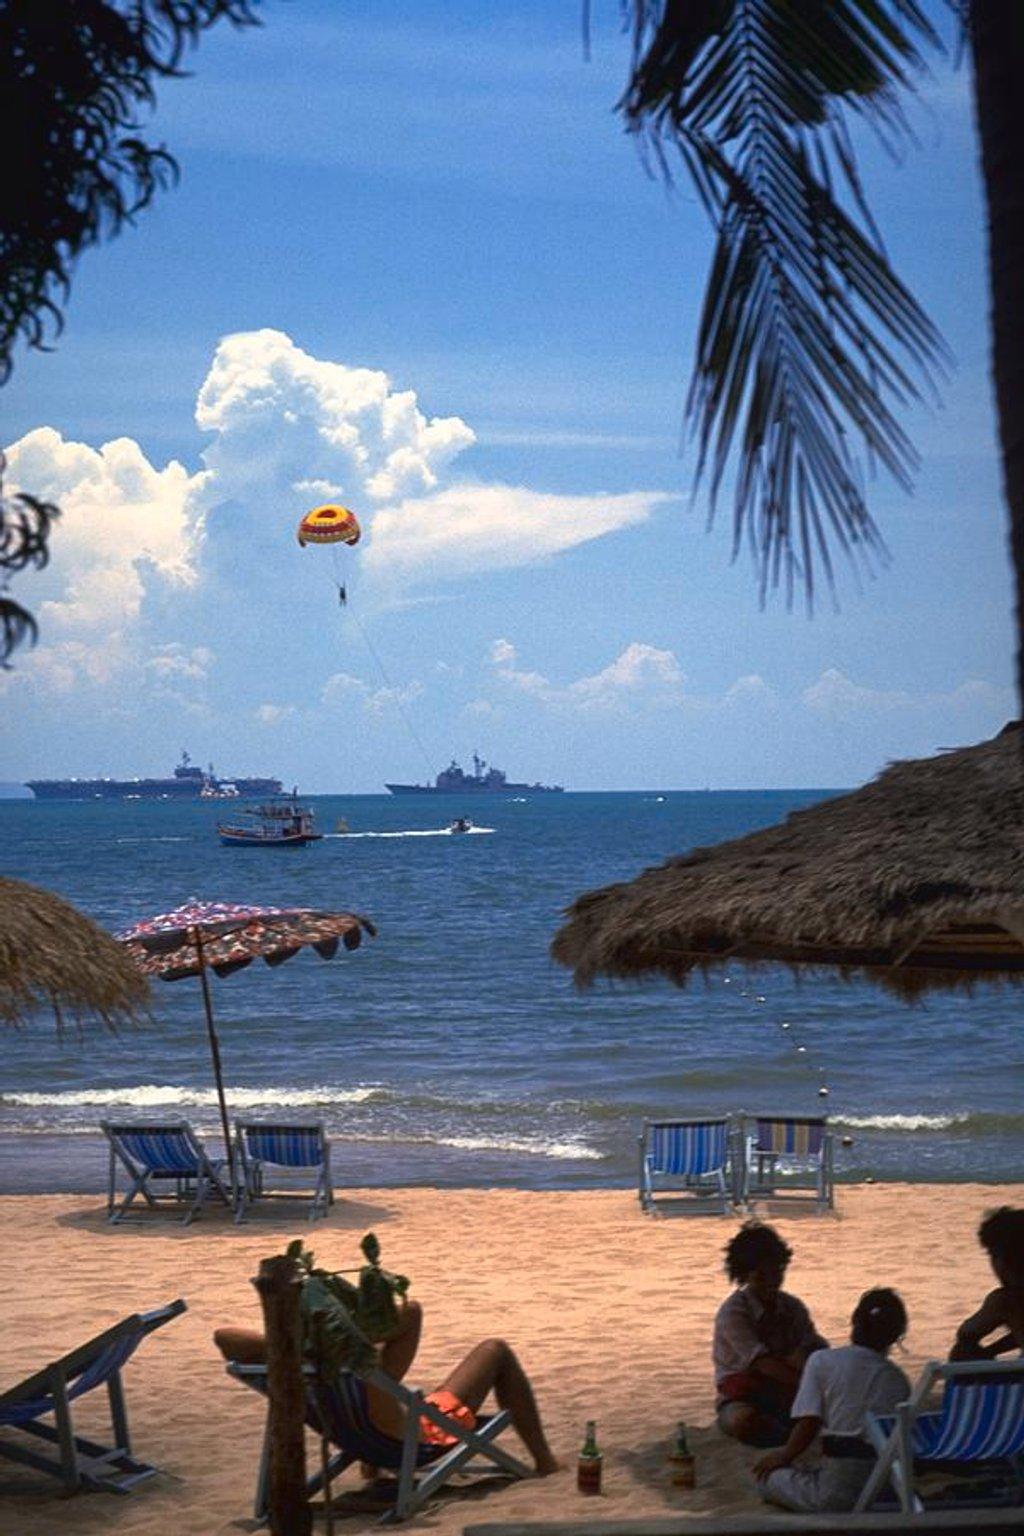 89 US Navy Off Pattaya, Thailand by travel